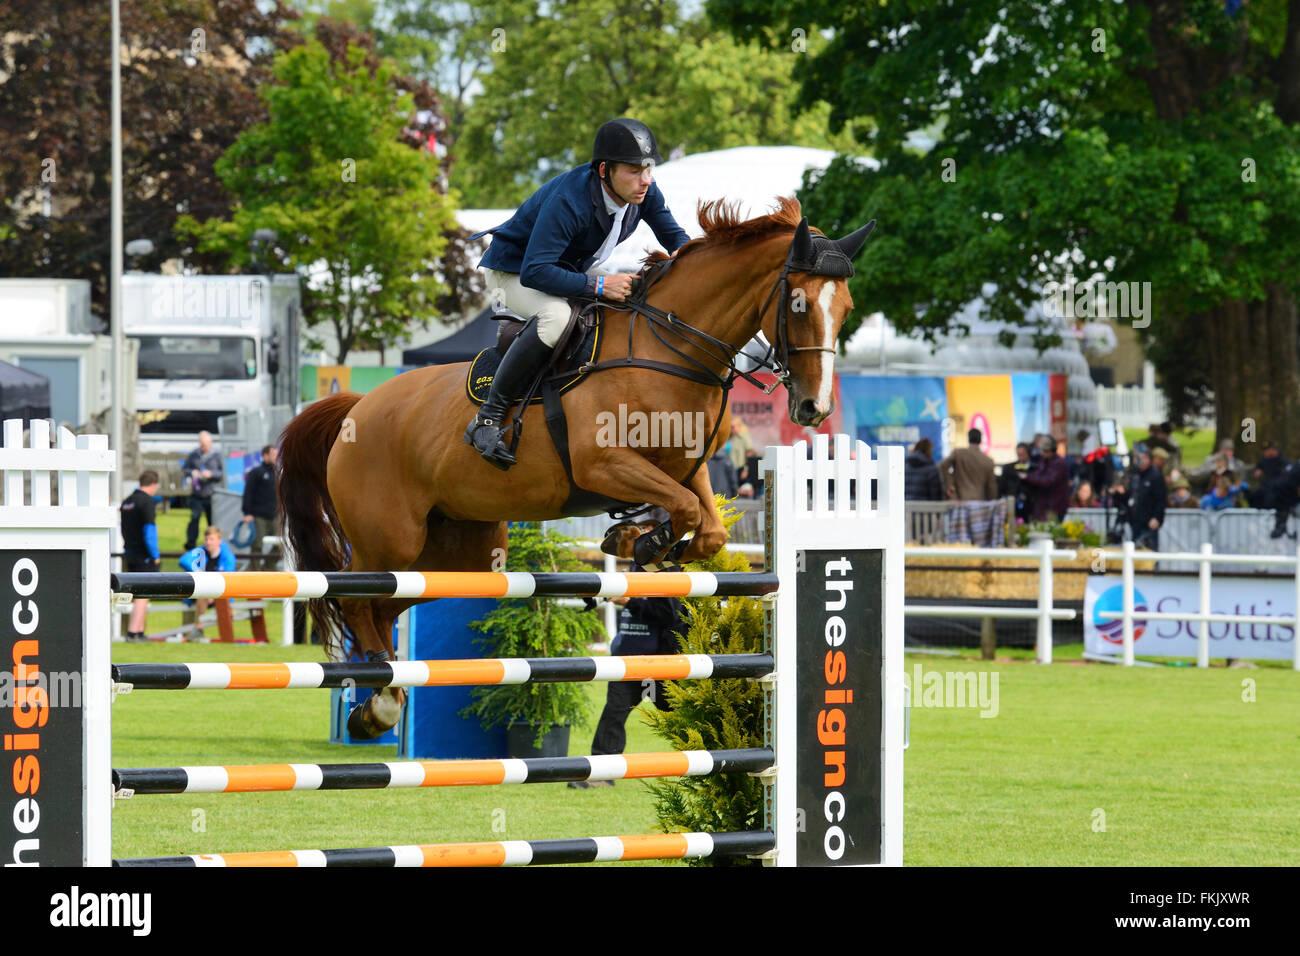 Show Jumping al Royal Highland Show 2015, Ingliston, Edimburgo, Scozia, Regno Unito Immagini Stock